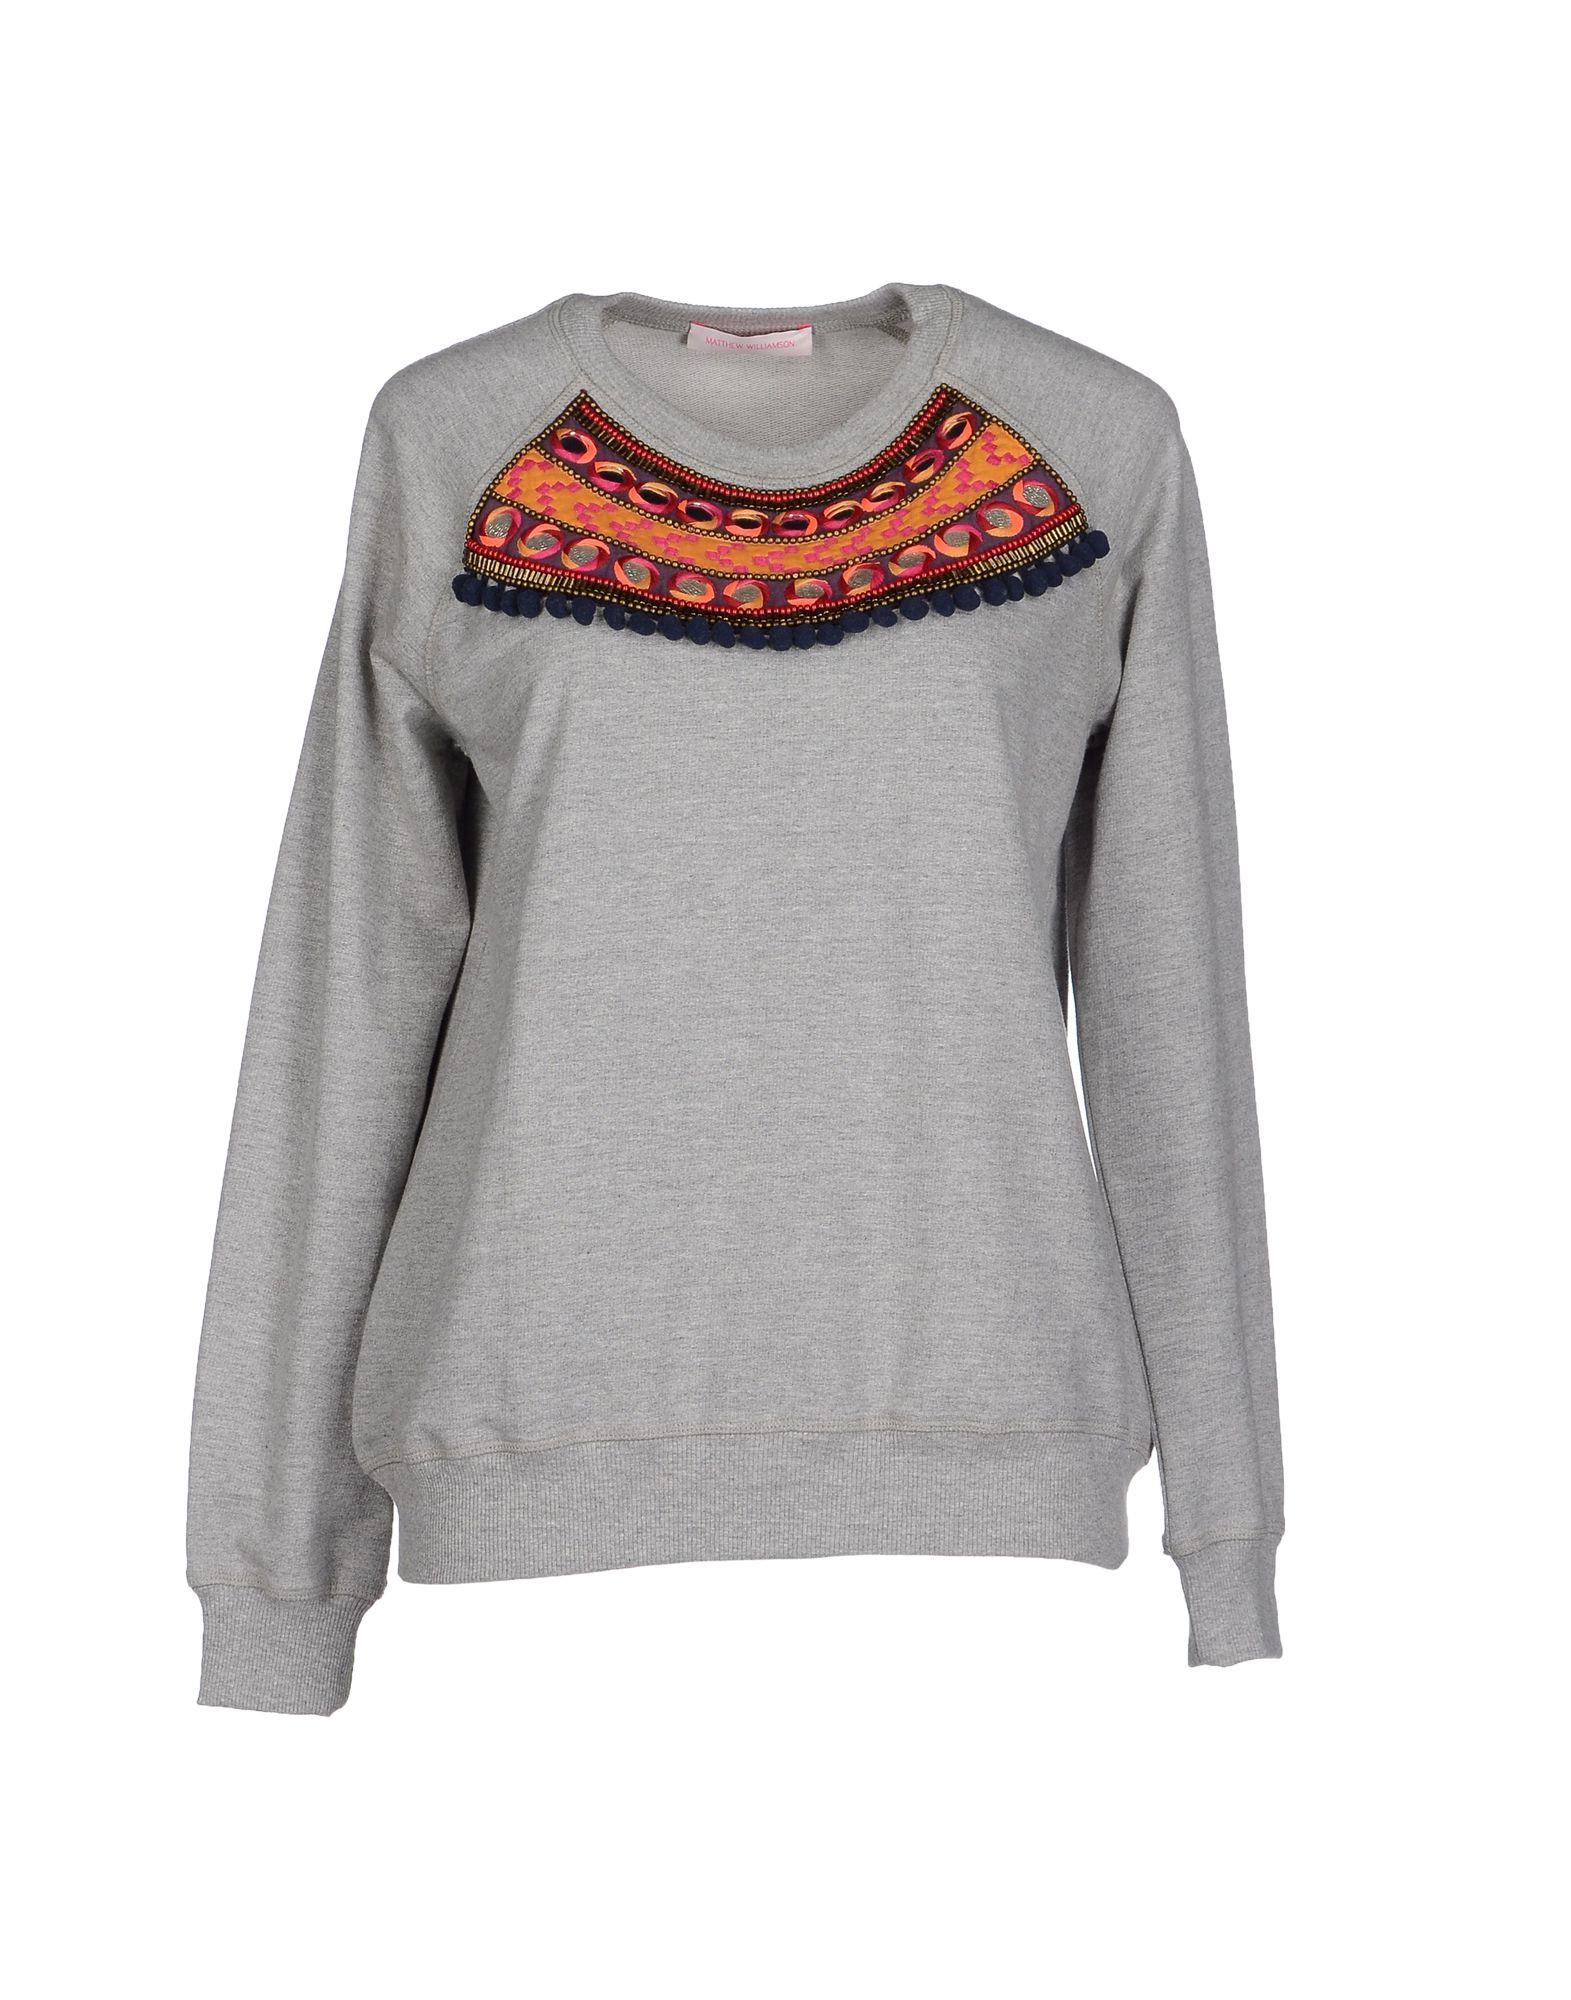 Matthew Williamson Sweatshirt In Gray Lyst